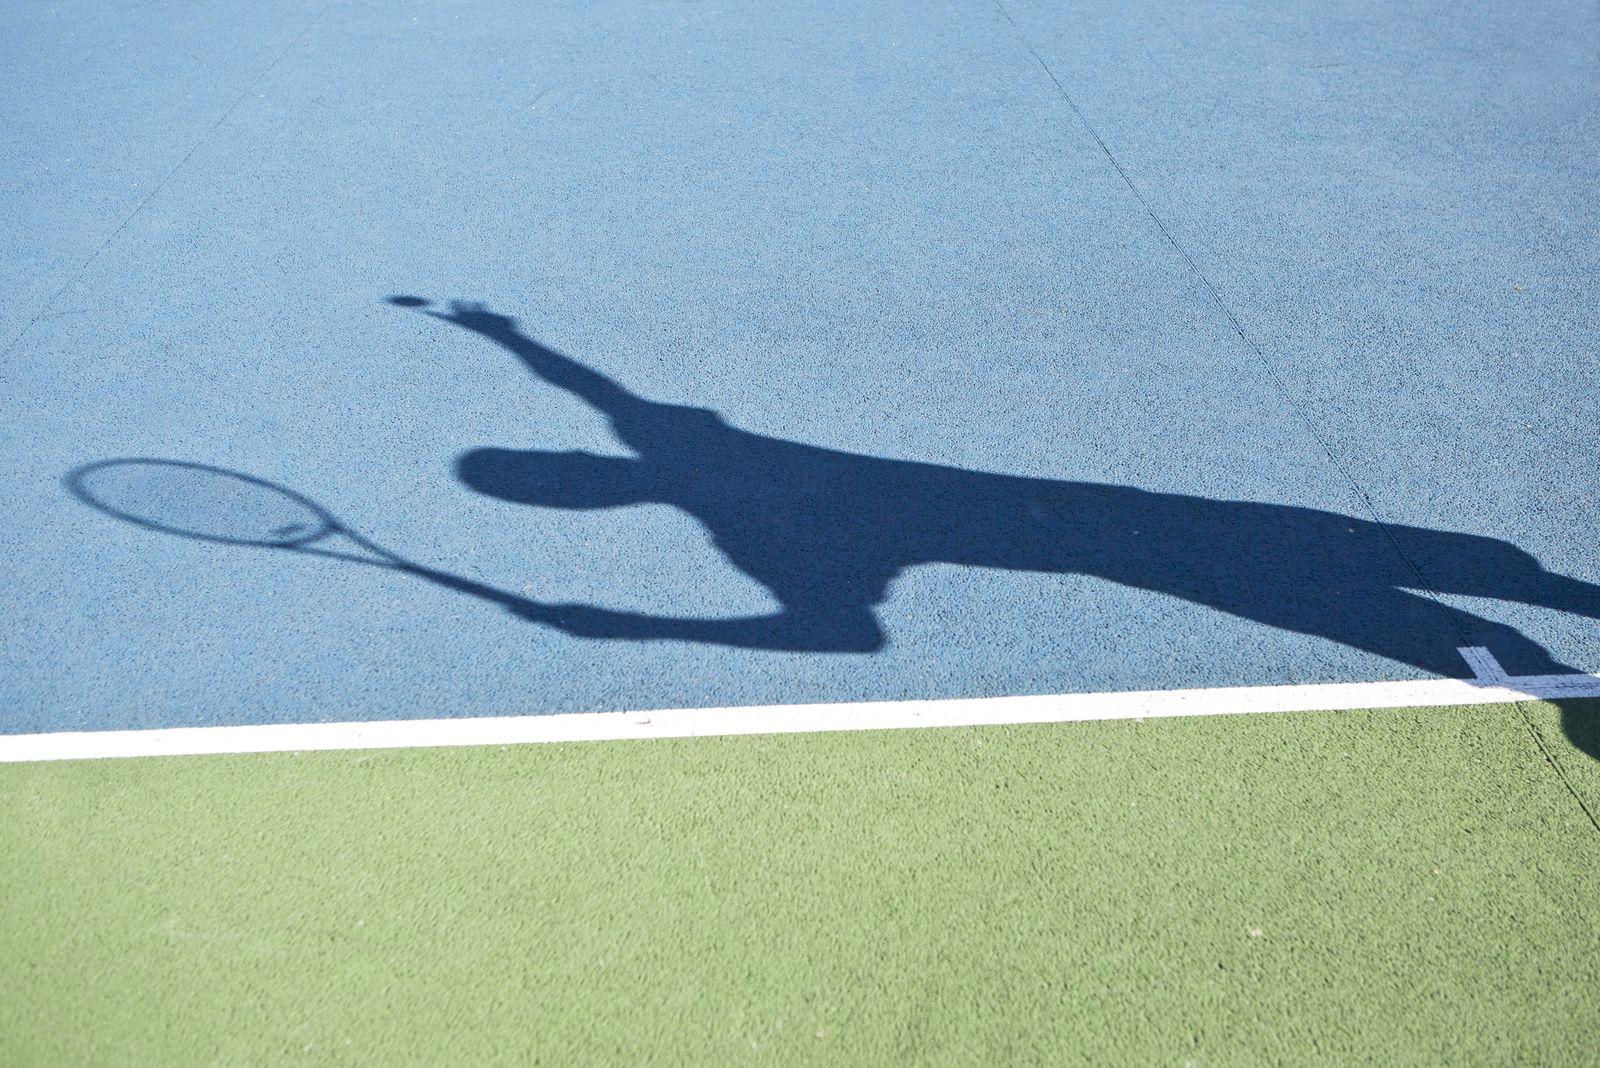 Shadow of tennis player serving ball PUBLICATIONxINxGERxSUIxAUTxONLY Copyright LaurencexMouton B388